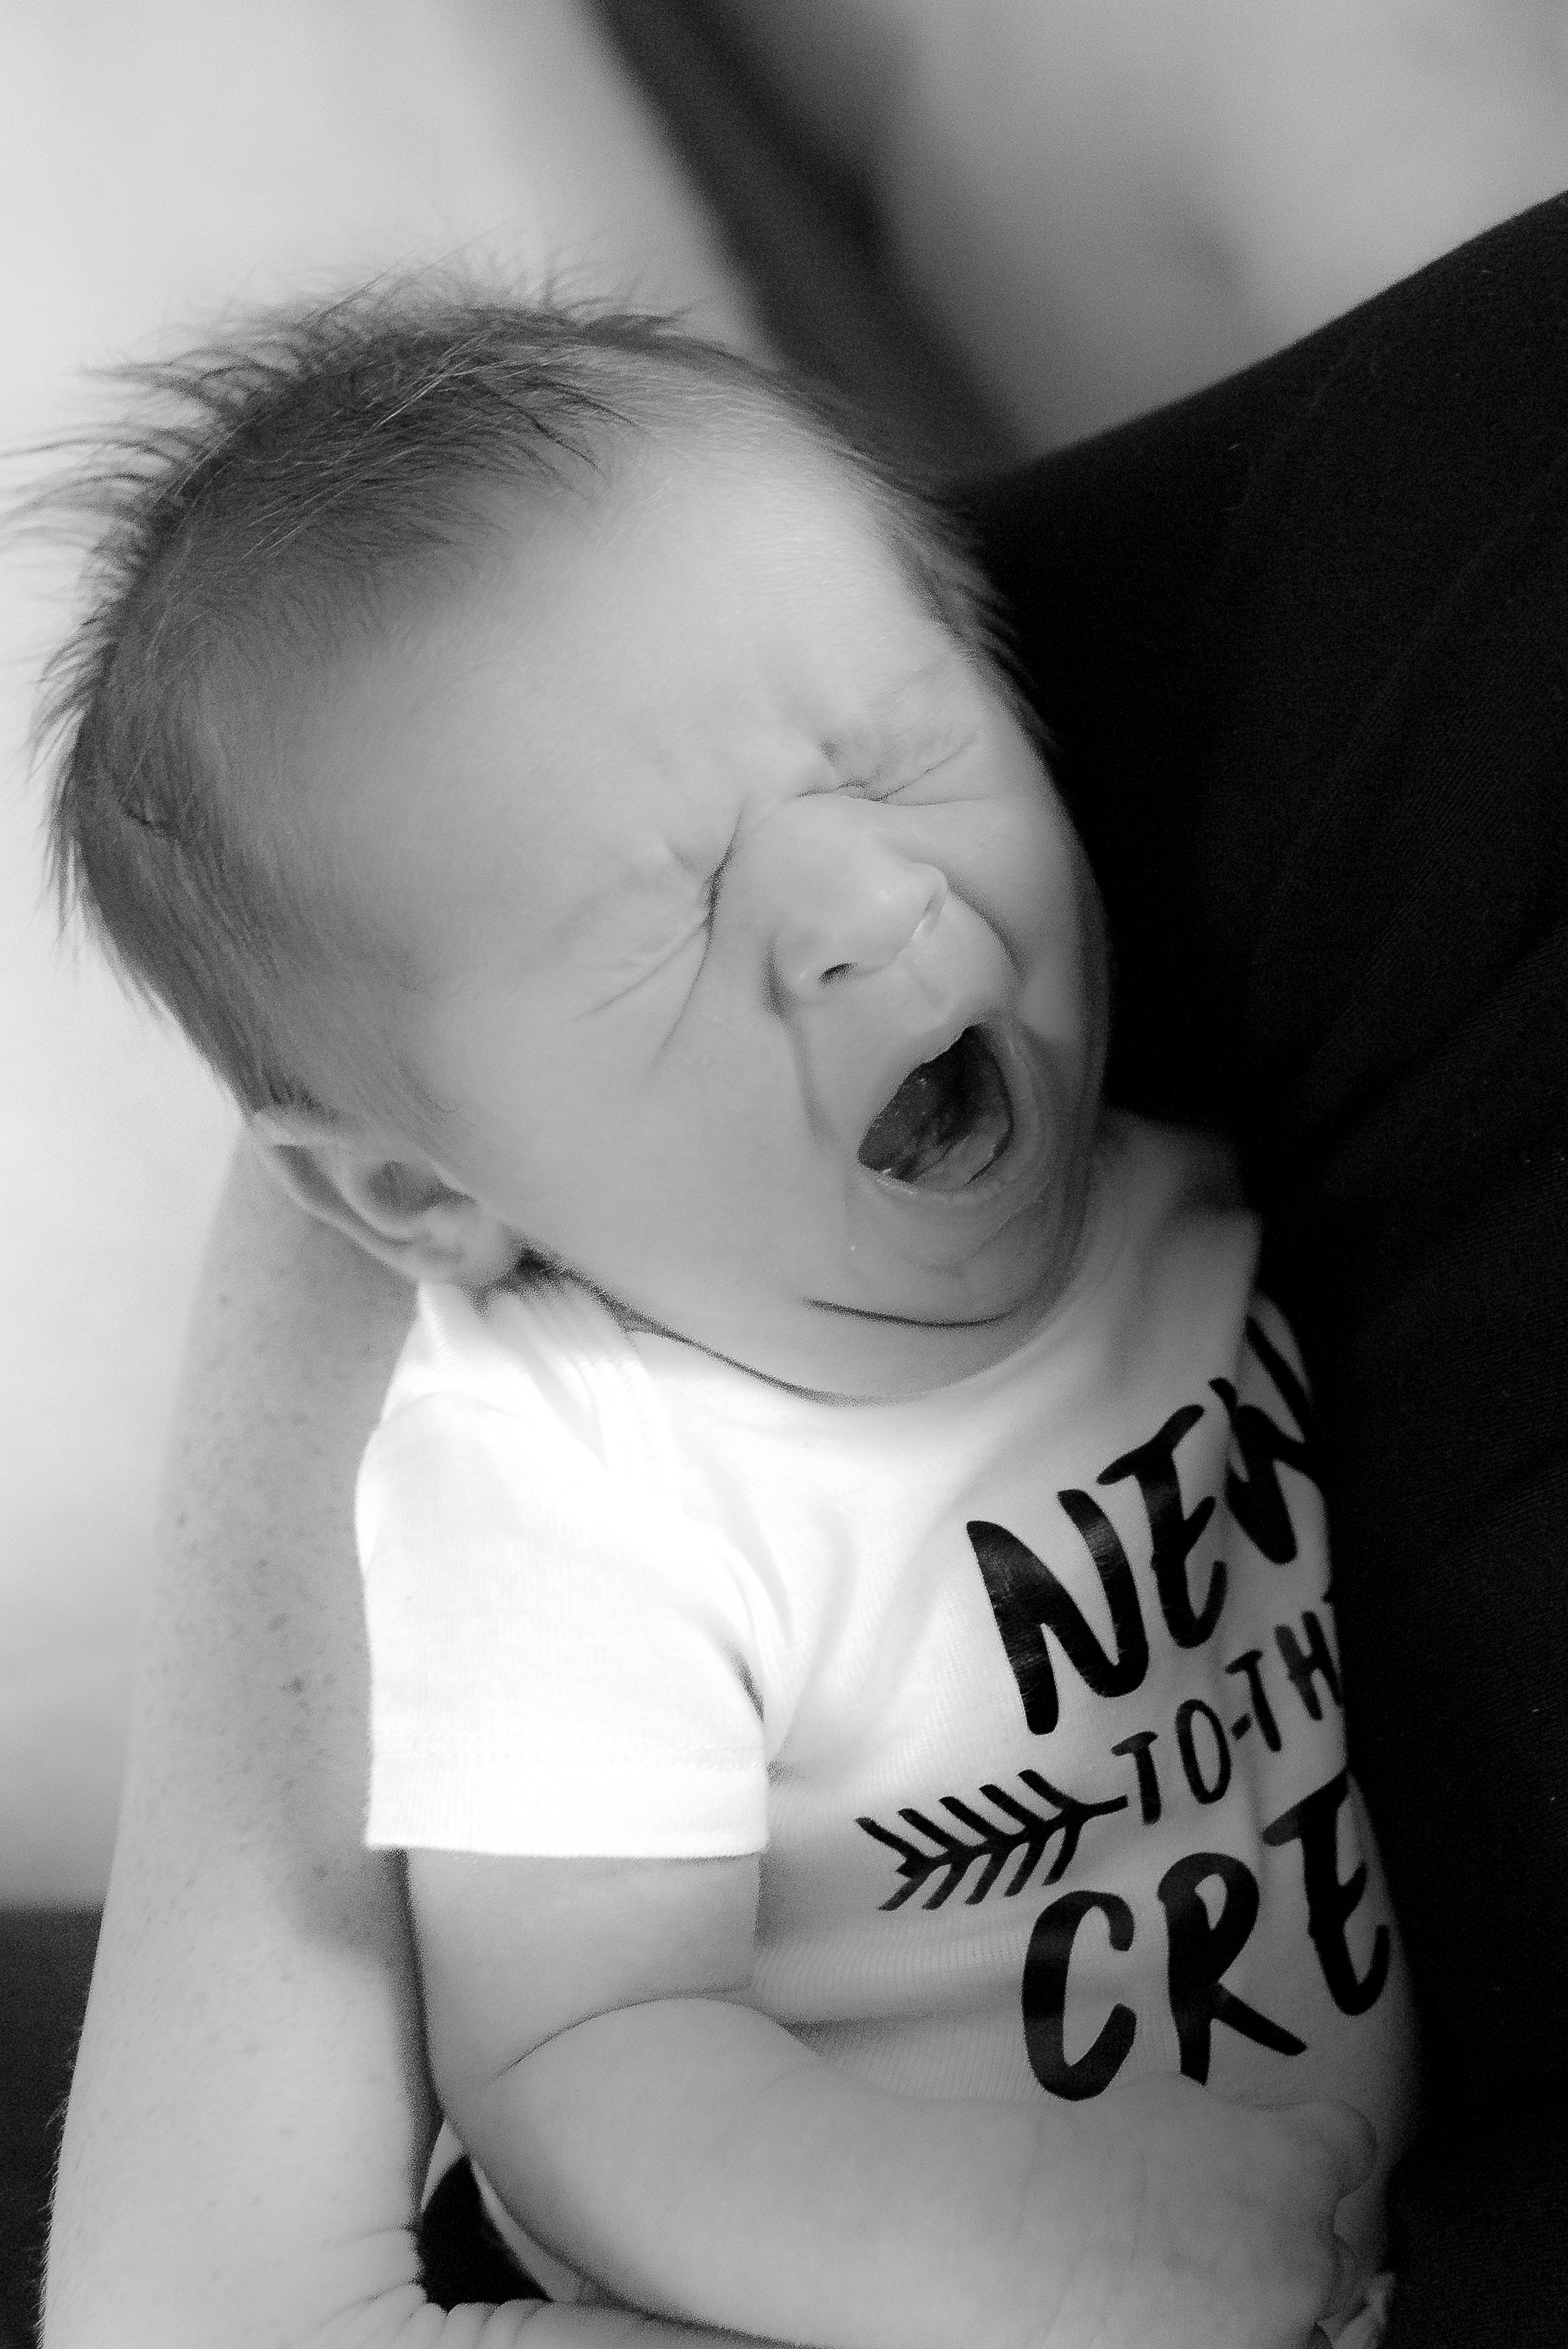 Erin-Fabio-Photography-Russell-Fischer_Newborns-109.jpg